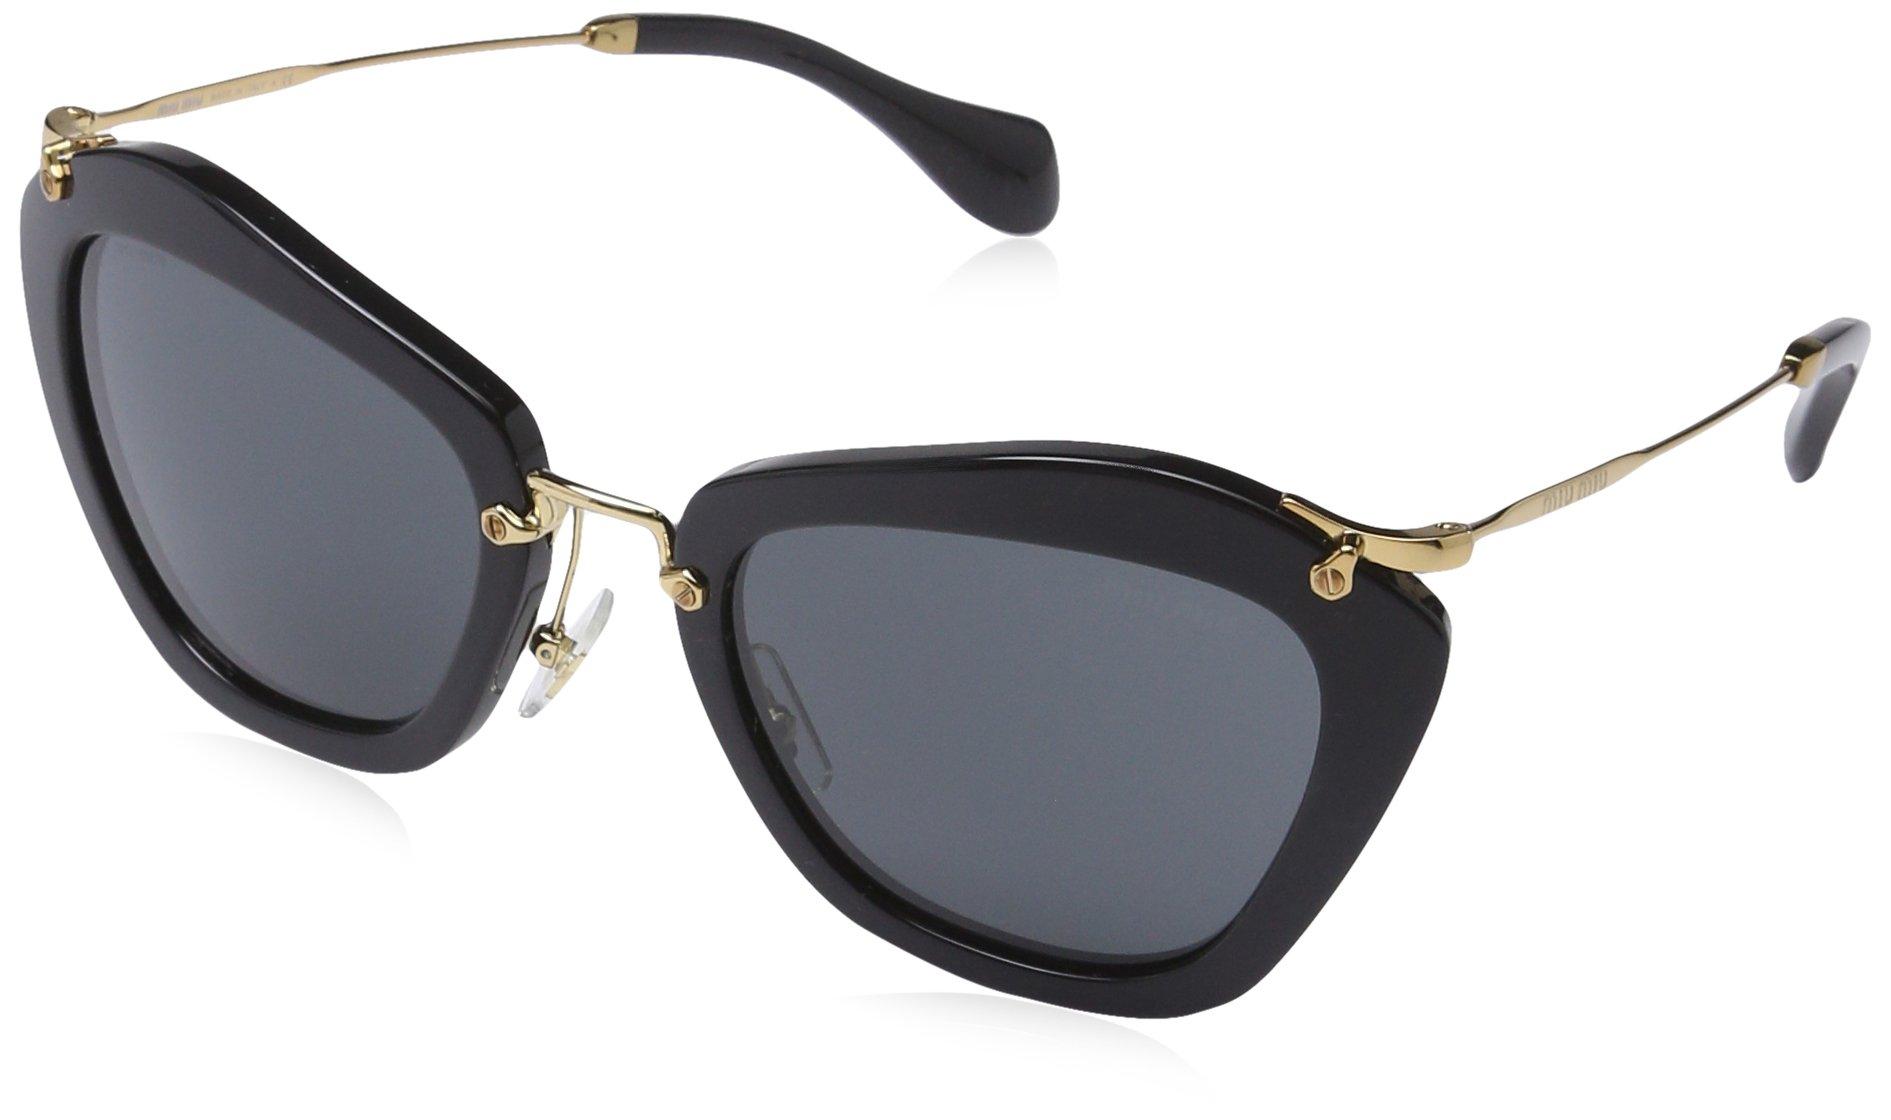 Miu Miu MU10NS Sunglasses-1AB/1A1 Black (Gray)-55mm